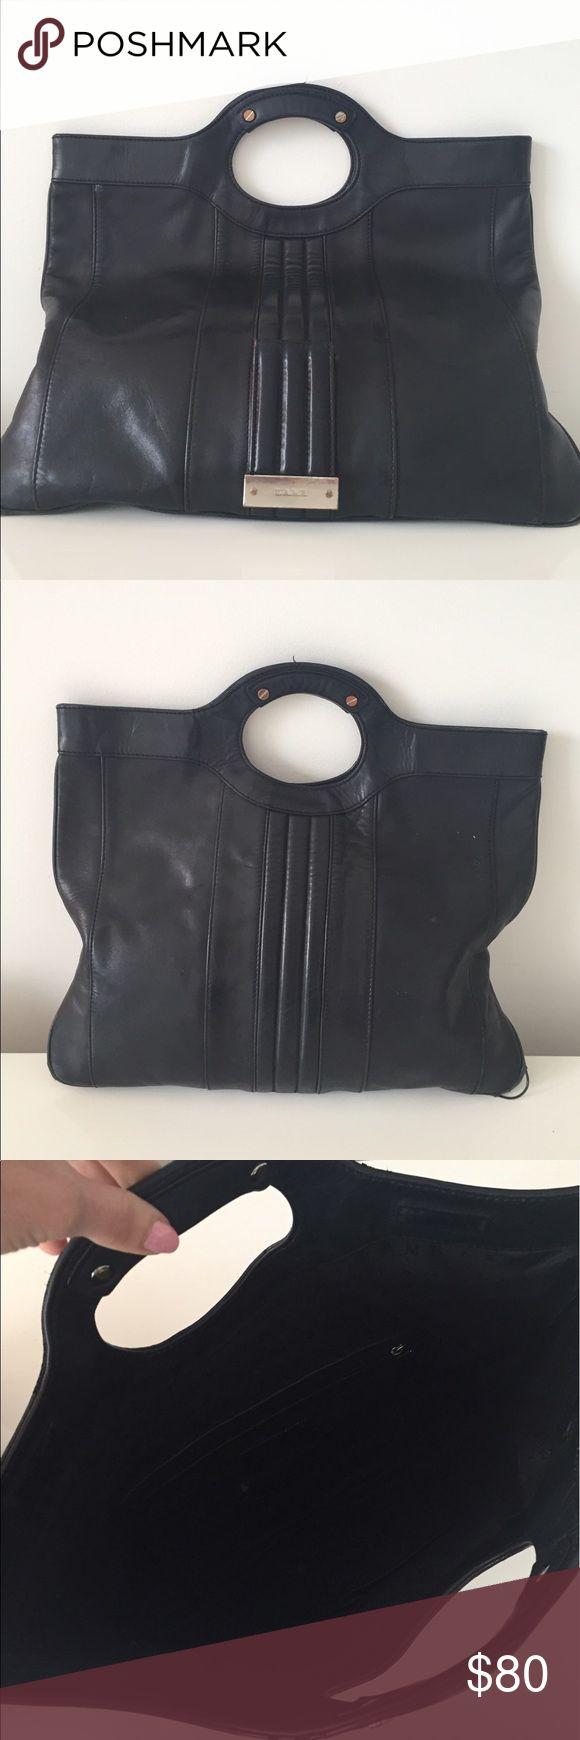 4th of July Sale 🇱🇷Large Black leather LAMB bag Large Black leather L.A.M.B bag 100% Authentic L.A.M.B. Bags